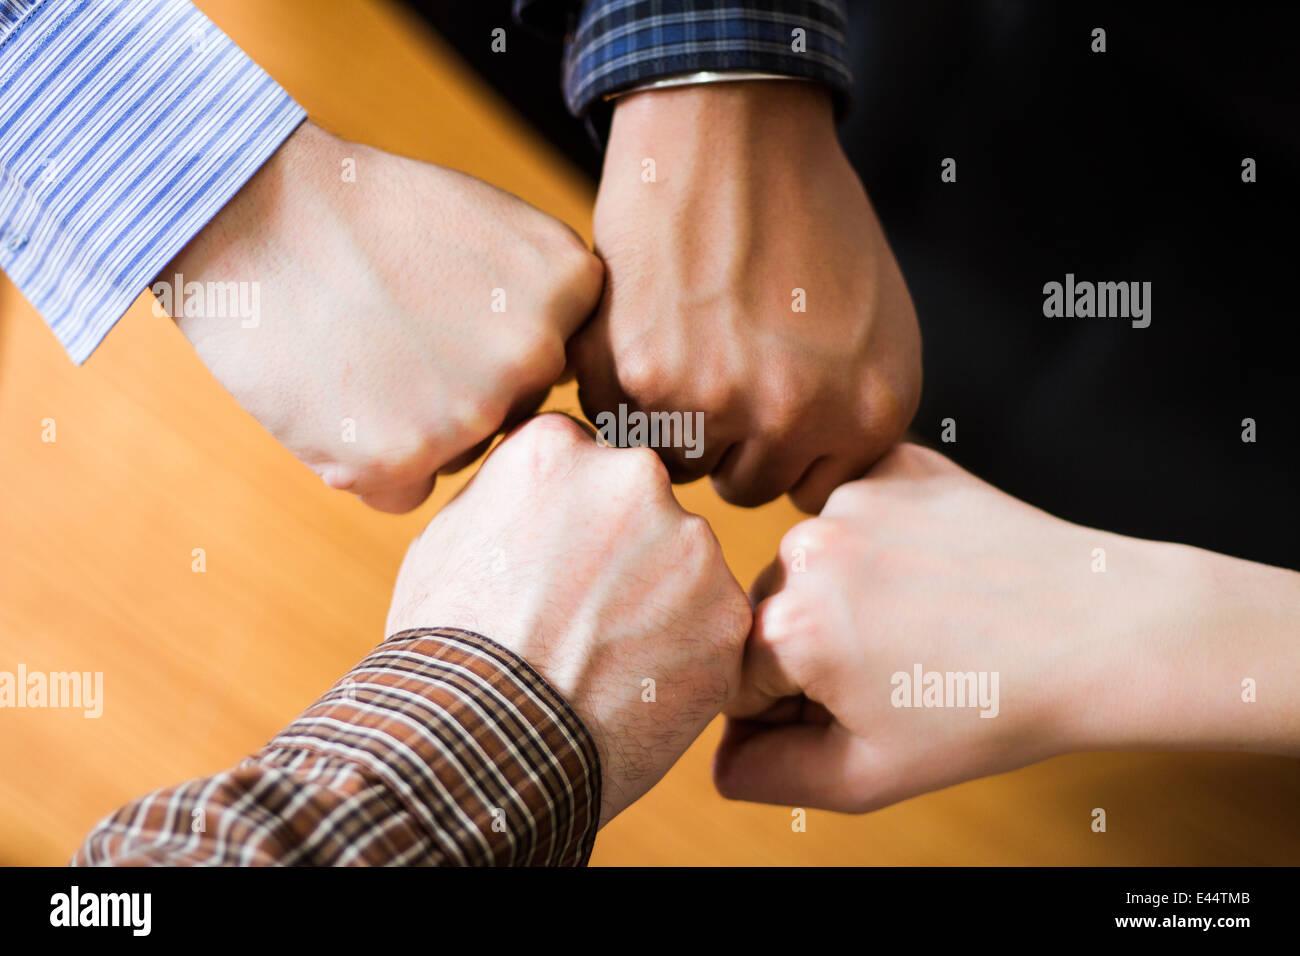 Teamwork always win the game - Stock Image